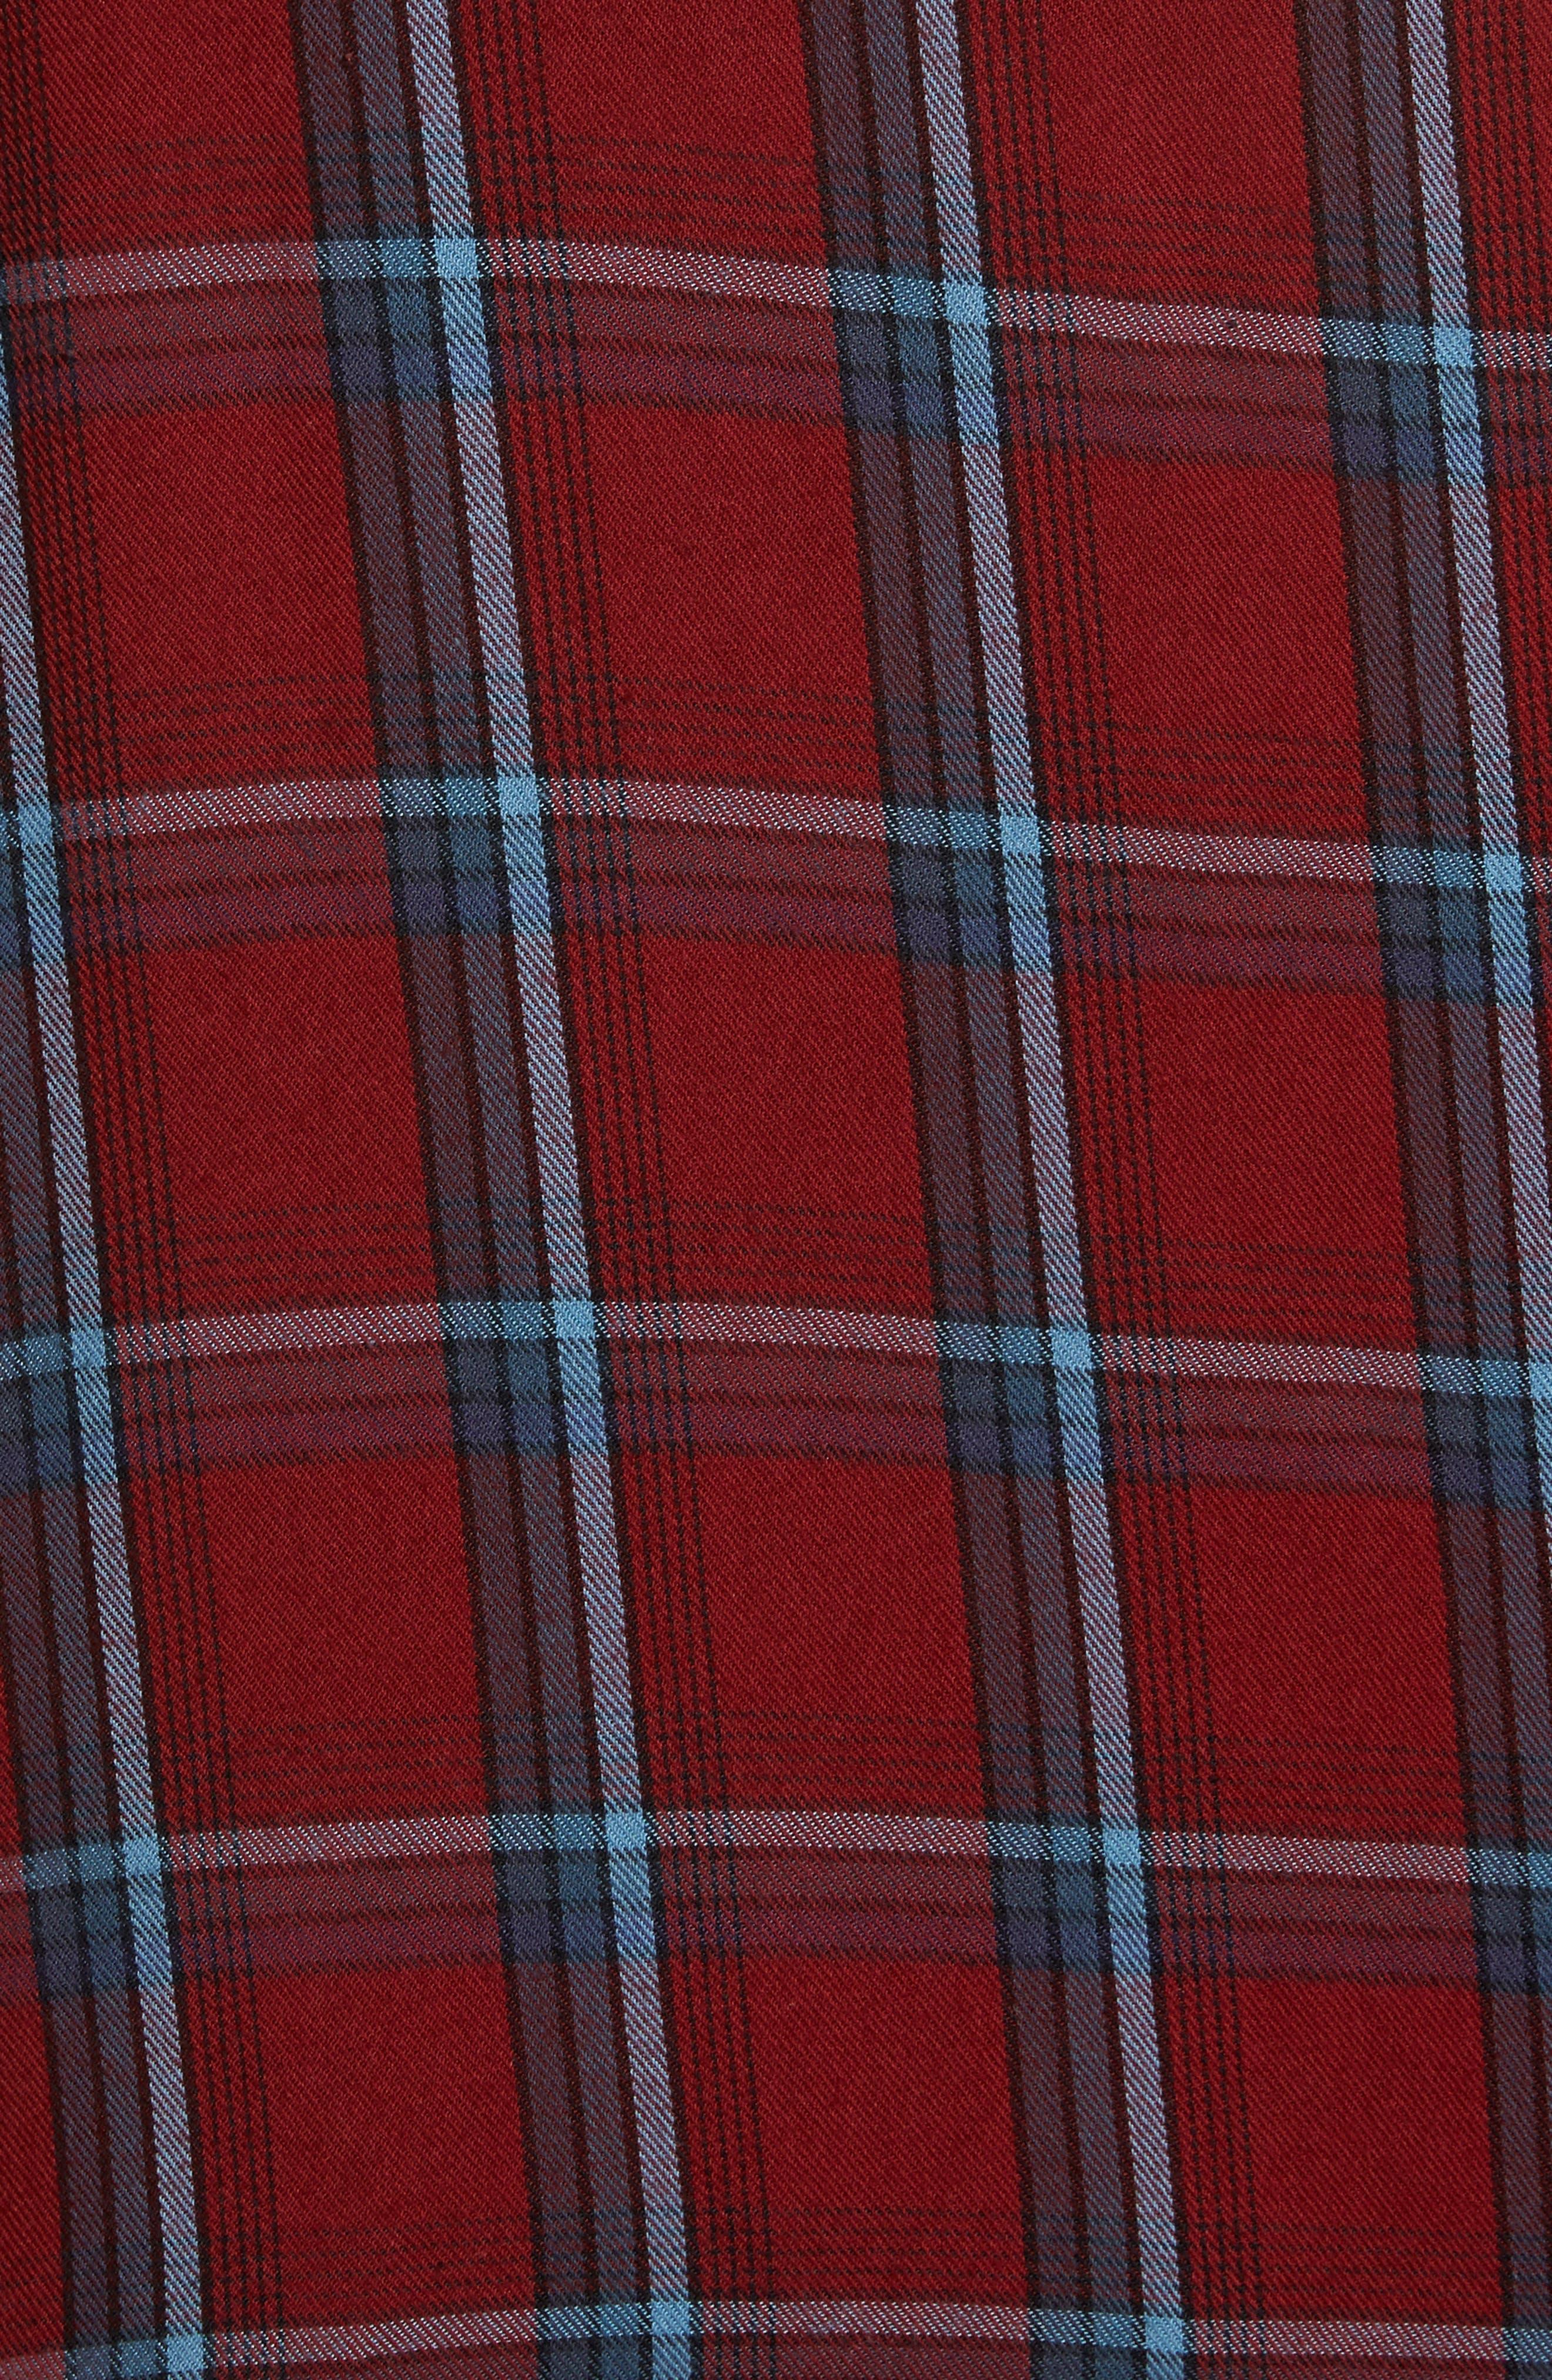 Ruffle Plaid Boyfriend Shirt,                             Alternate thumbnail 5, color,                             Red Syrah Three Box Tartan